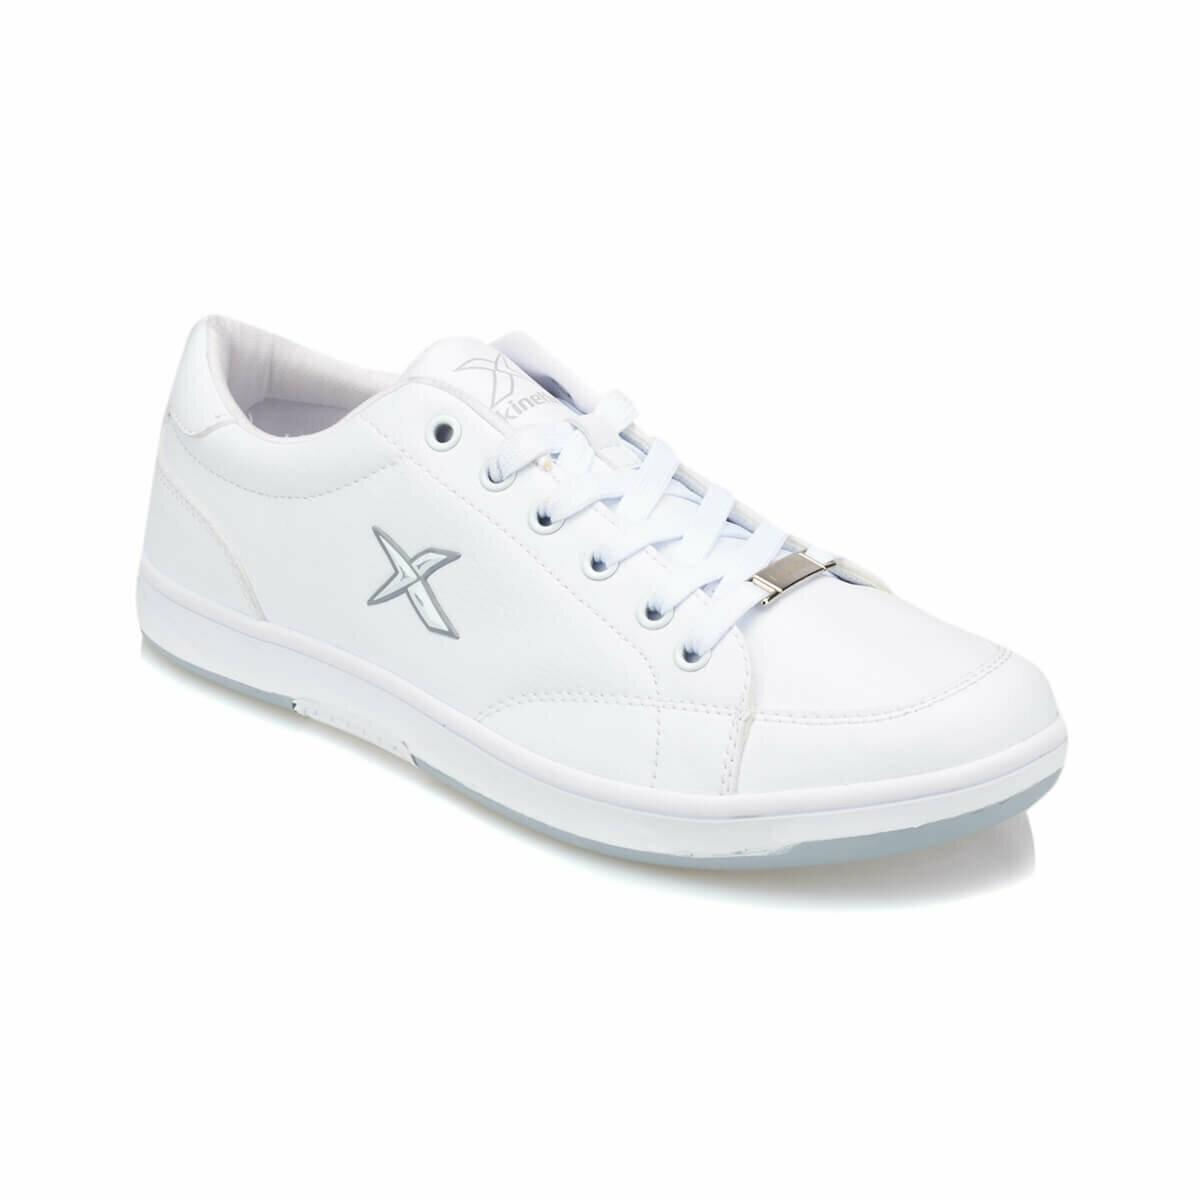 Zapatillas de deporte FLO para hombre blancas, negras, azul marino, a la moda, informales, cómodas, informales, zapatillas de deporte para hombre, zapatillas de estar por casa